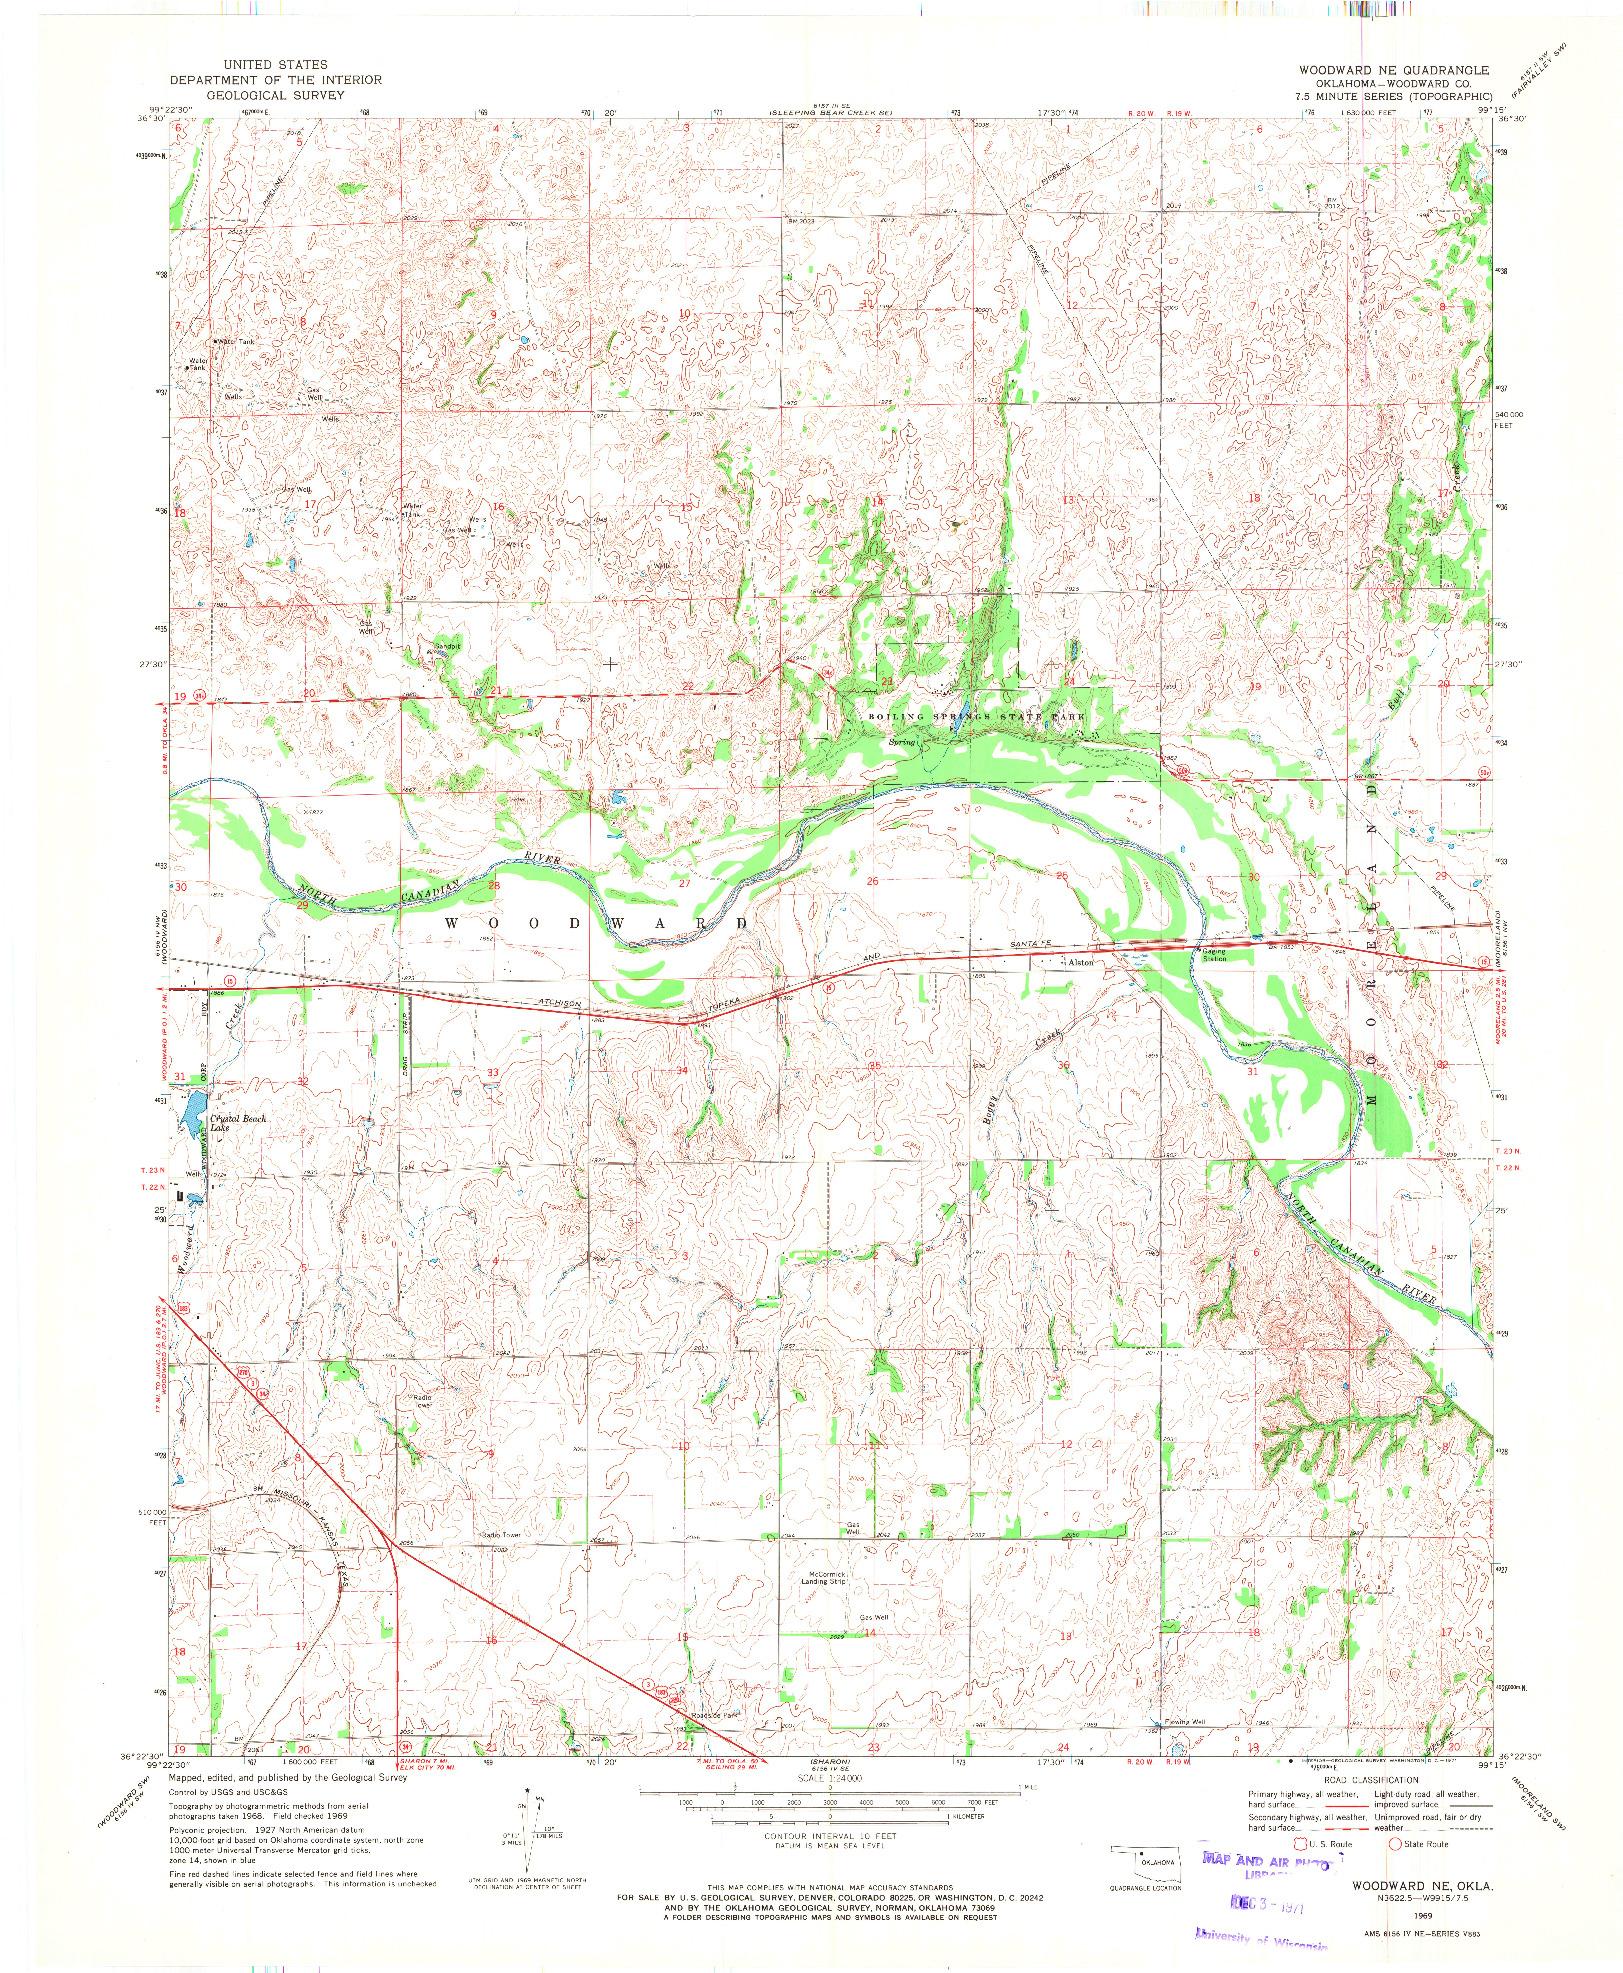 USGS 1:24000-SCALE QUADRANGLE FOR WOODWARD NE, OK 1969